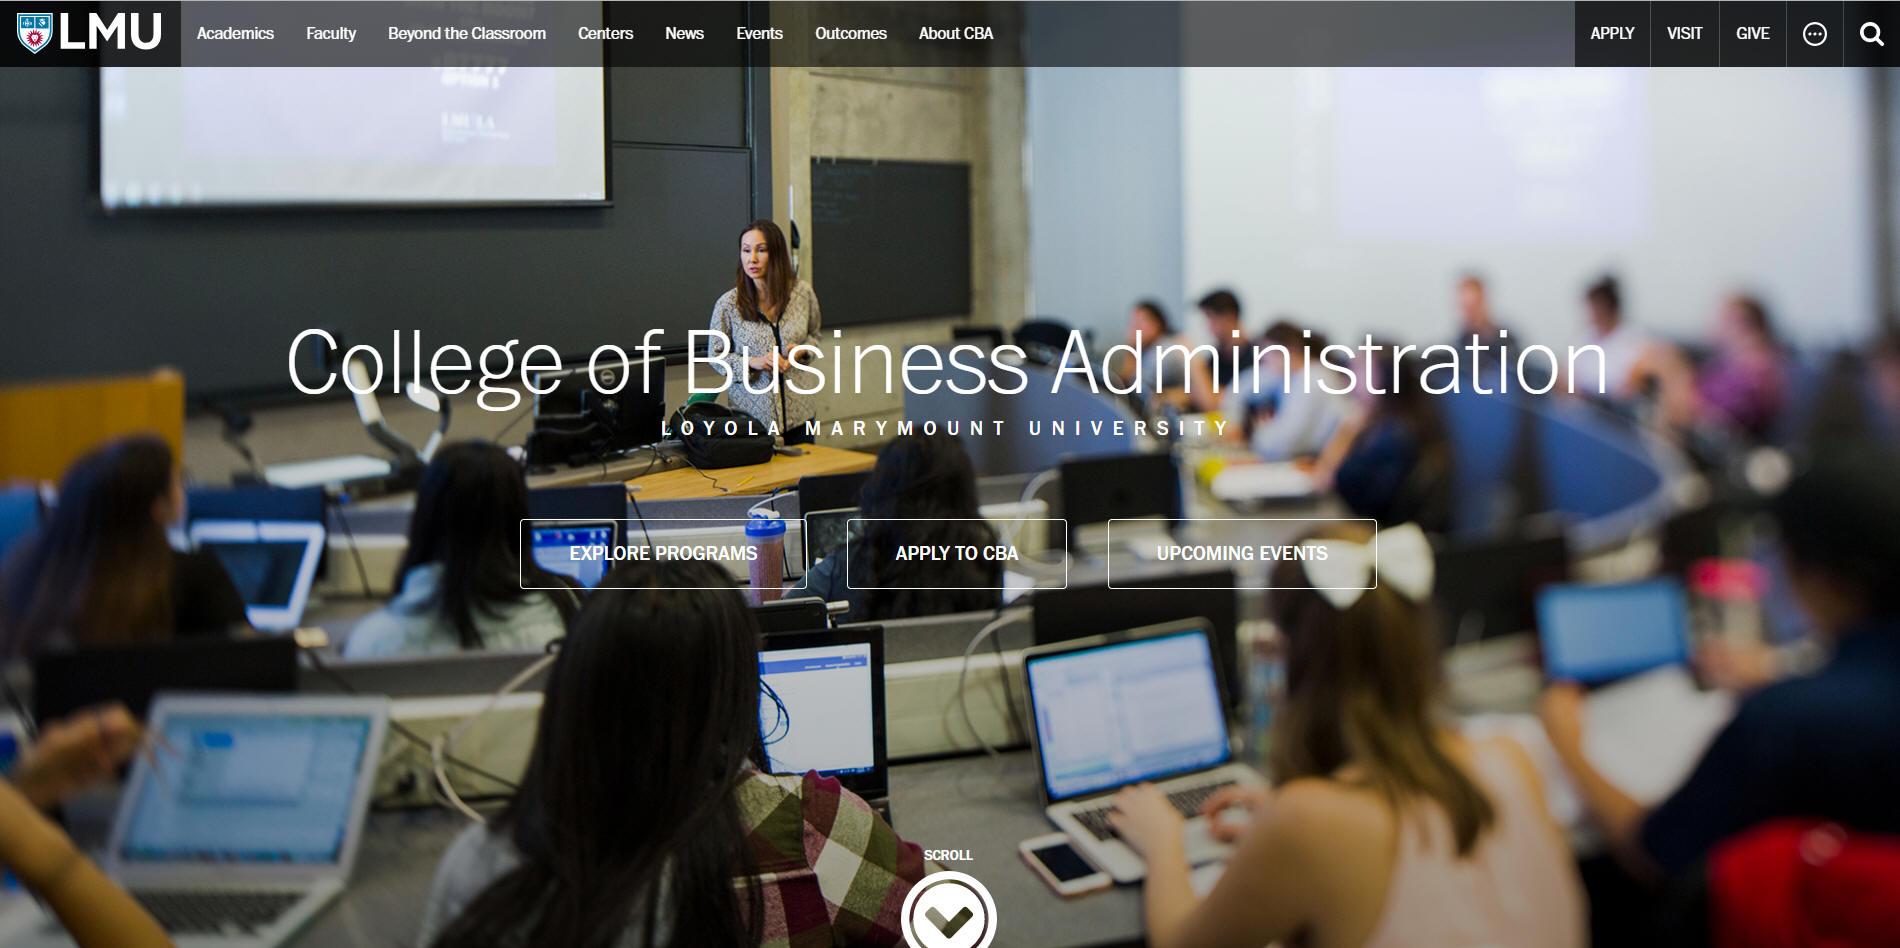 Loyola Marymount University College of Business Administration: Average GMAT Scores. Rankings. and MBA Starting Salary